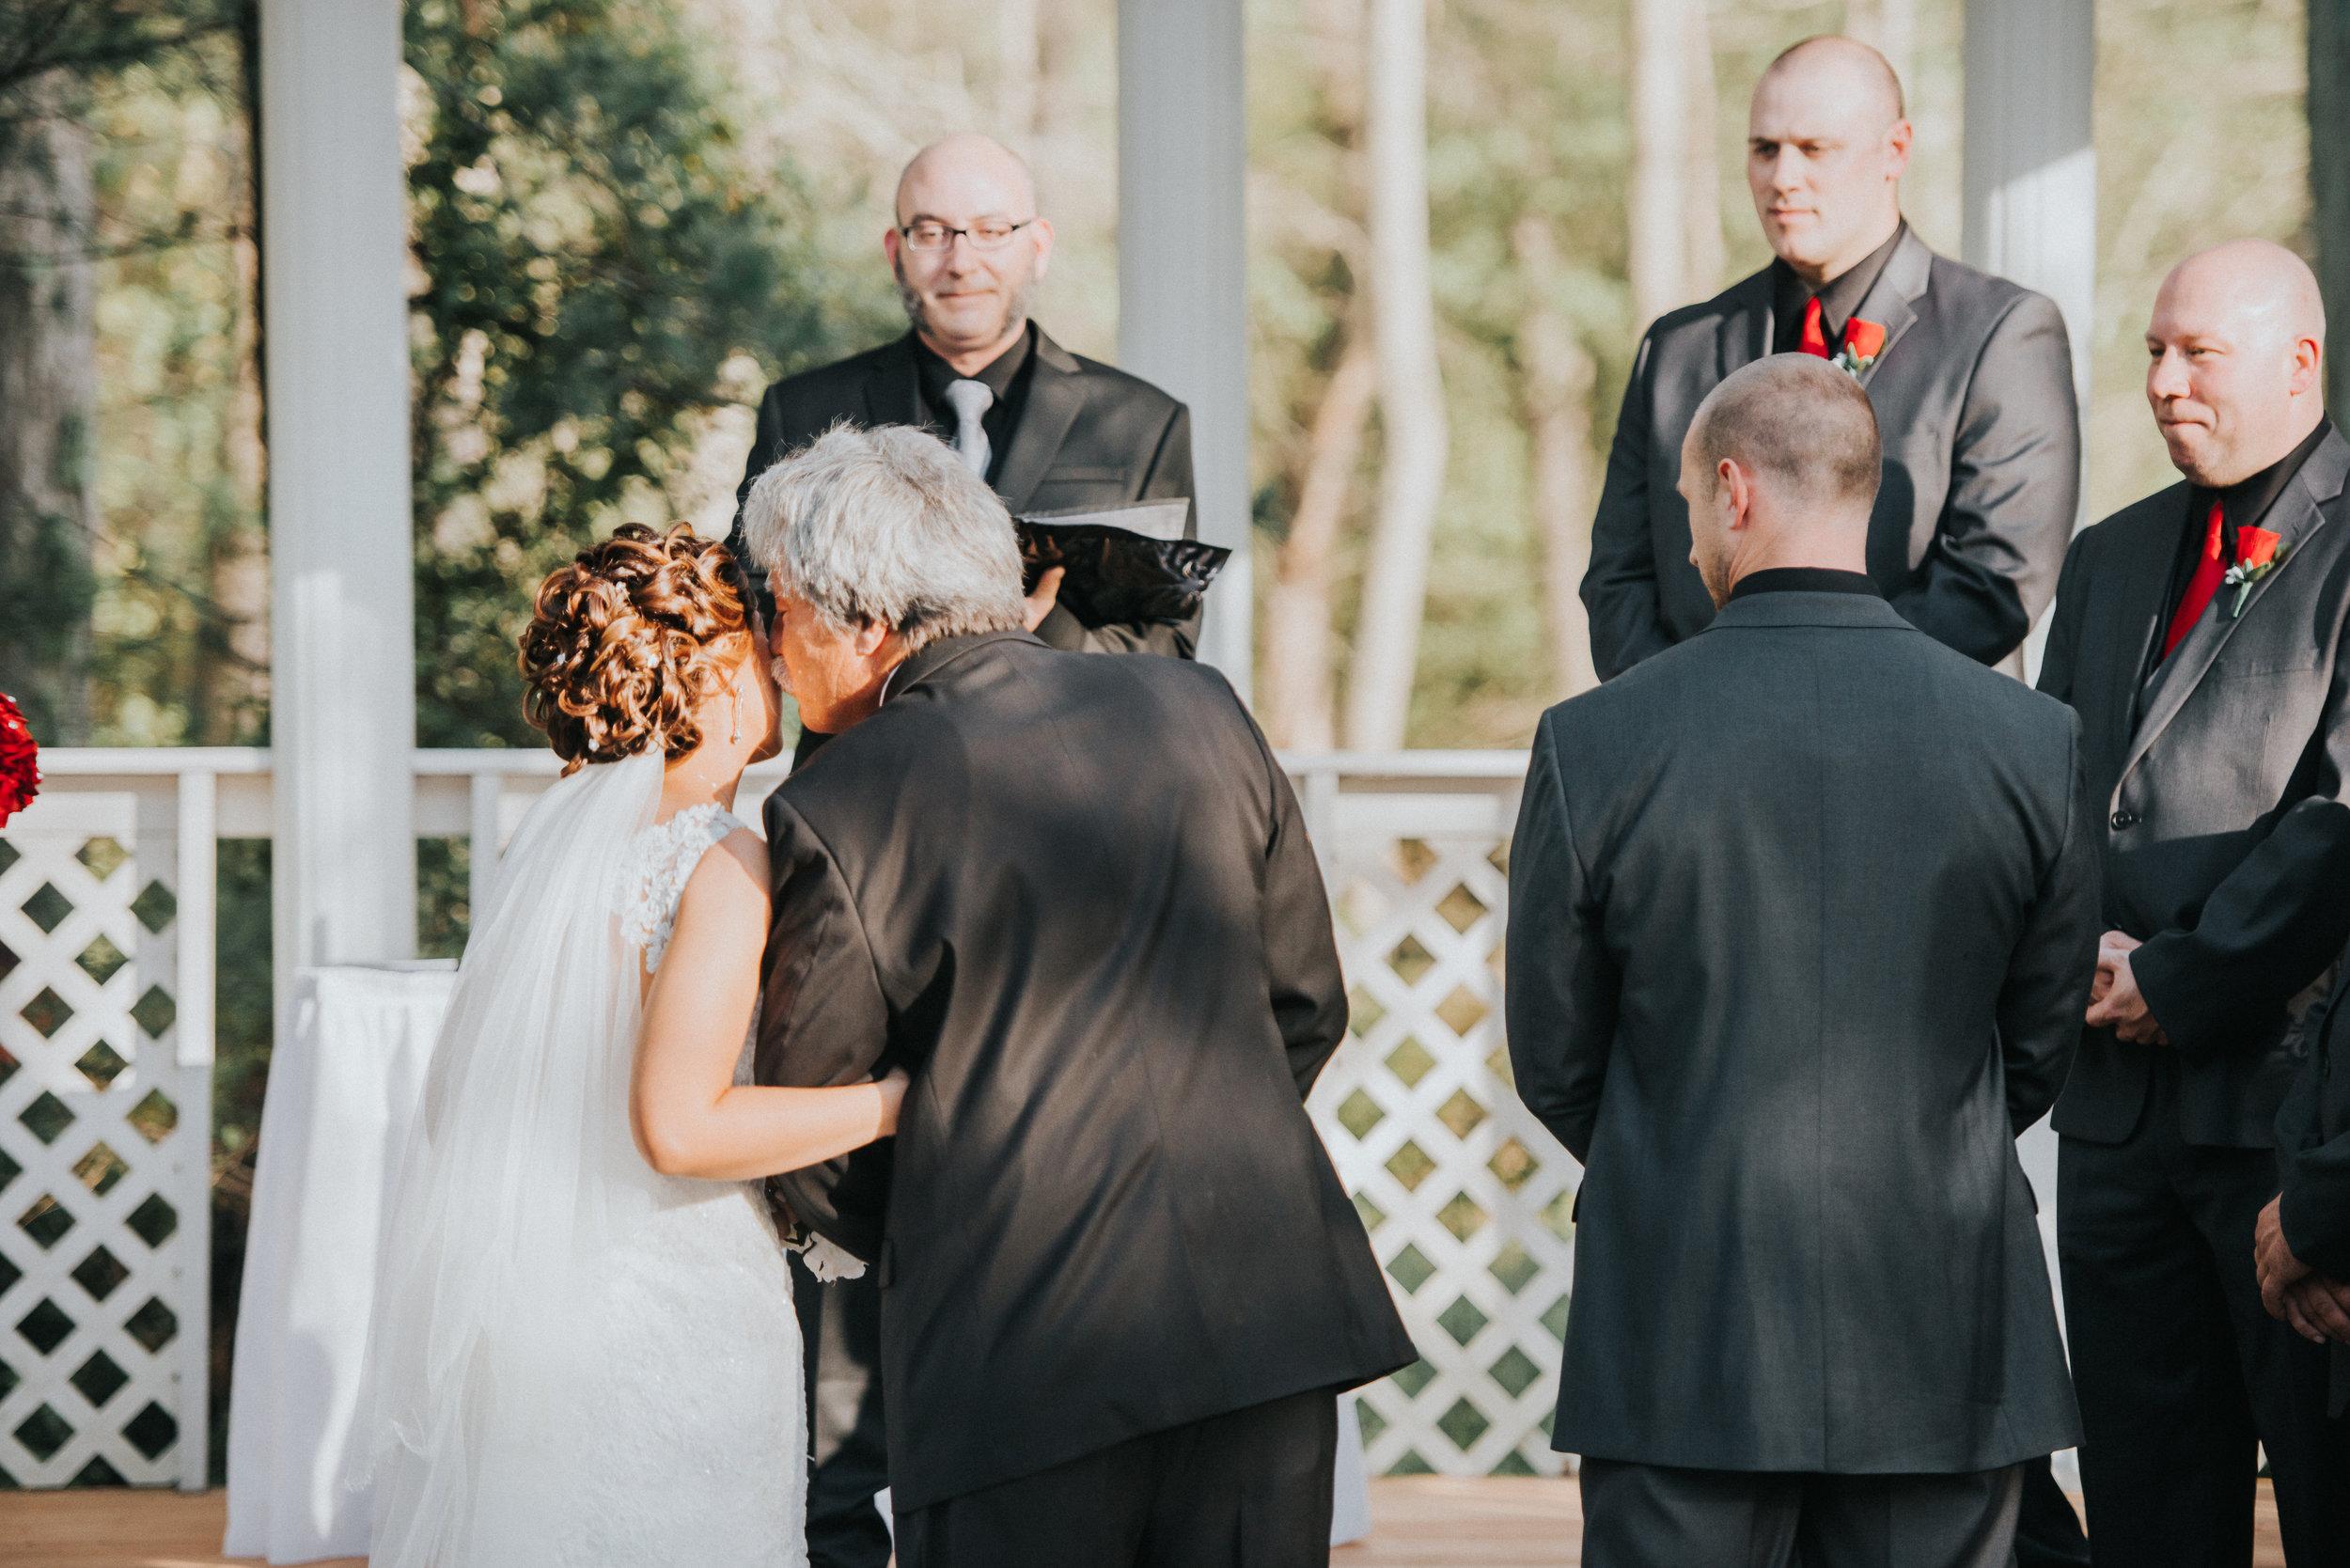 Christina-and-Gene-Wedding-Marla-Rain-Photography-325.jpg